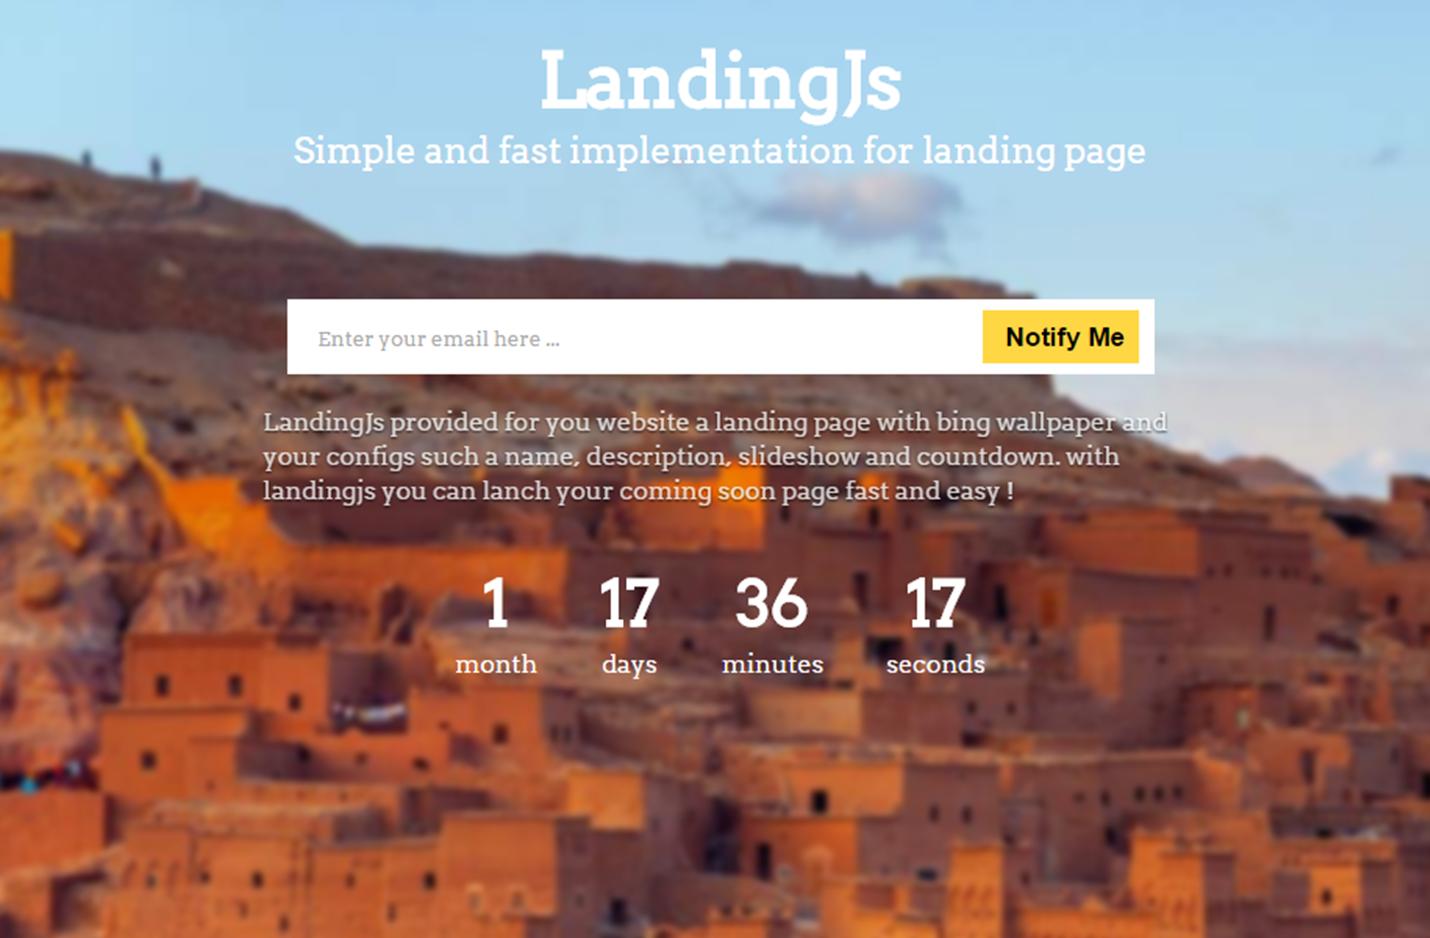 Landing.js javascript library